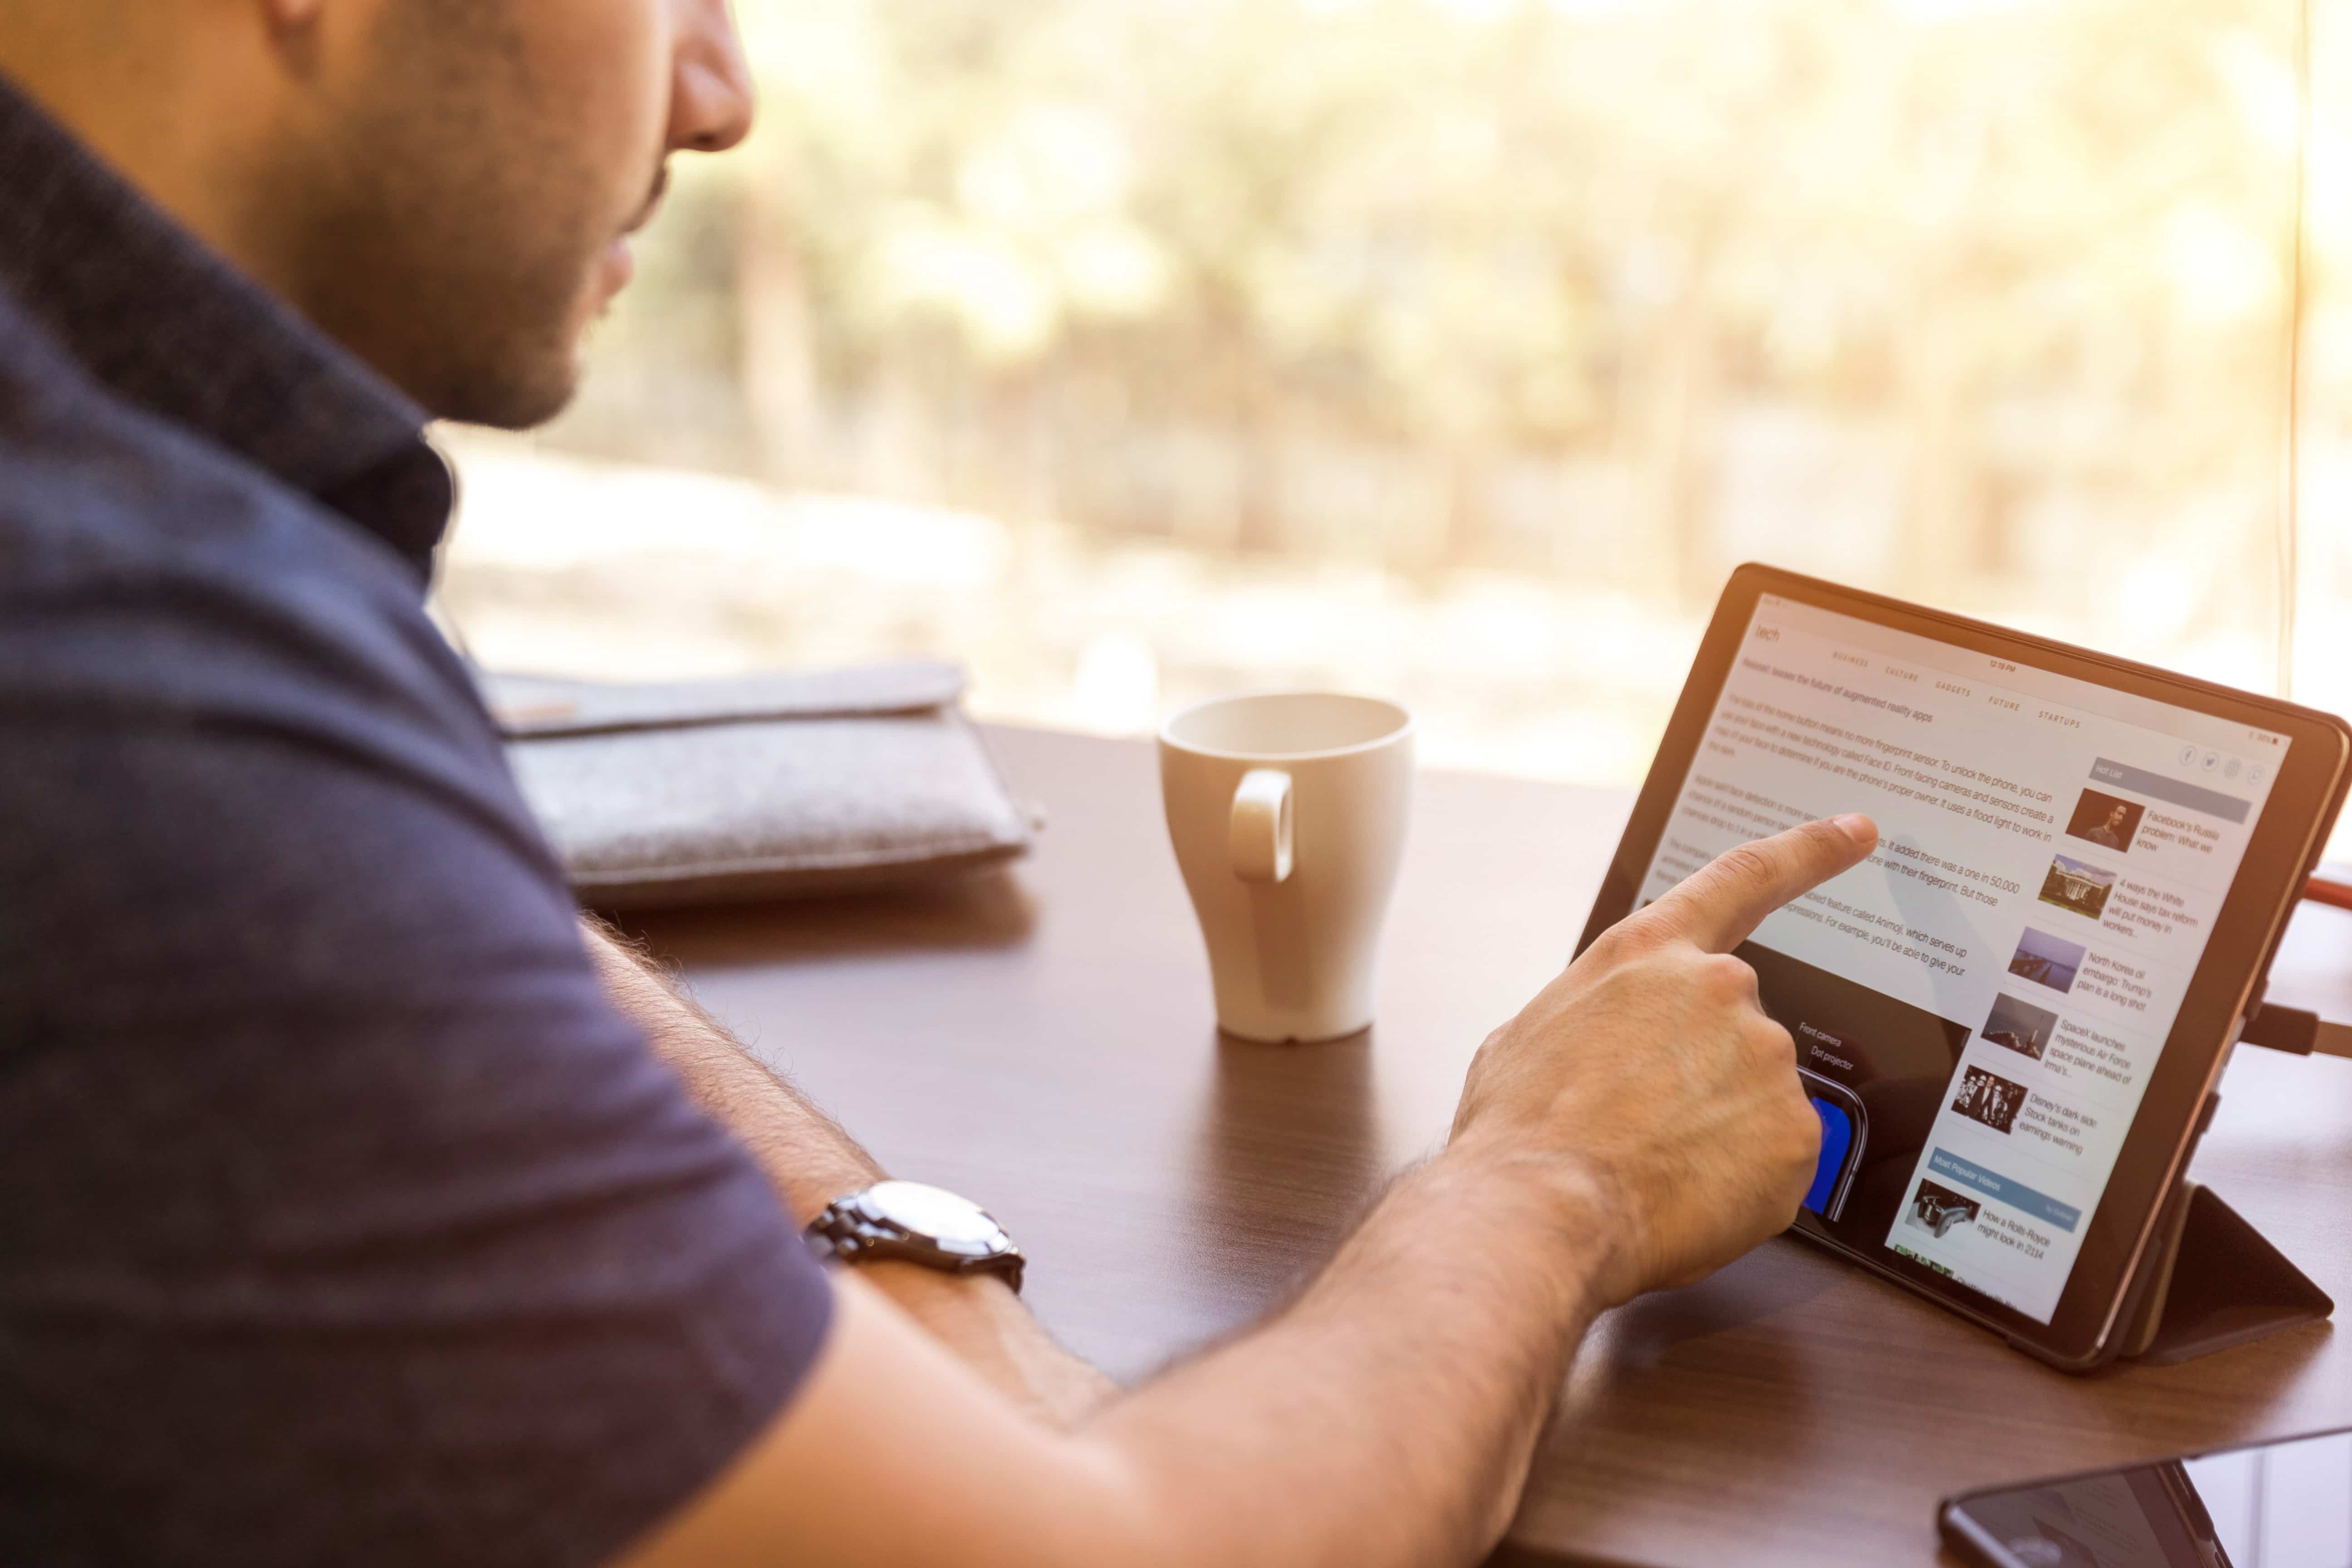 Digitaler Vertrieb – die Chancen für KMU heute linkedin sales navigator UK1N66KUkMk unsplash min 1